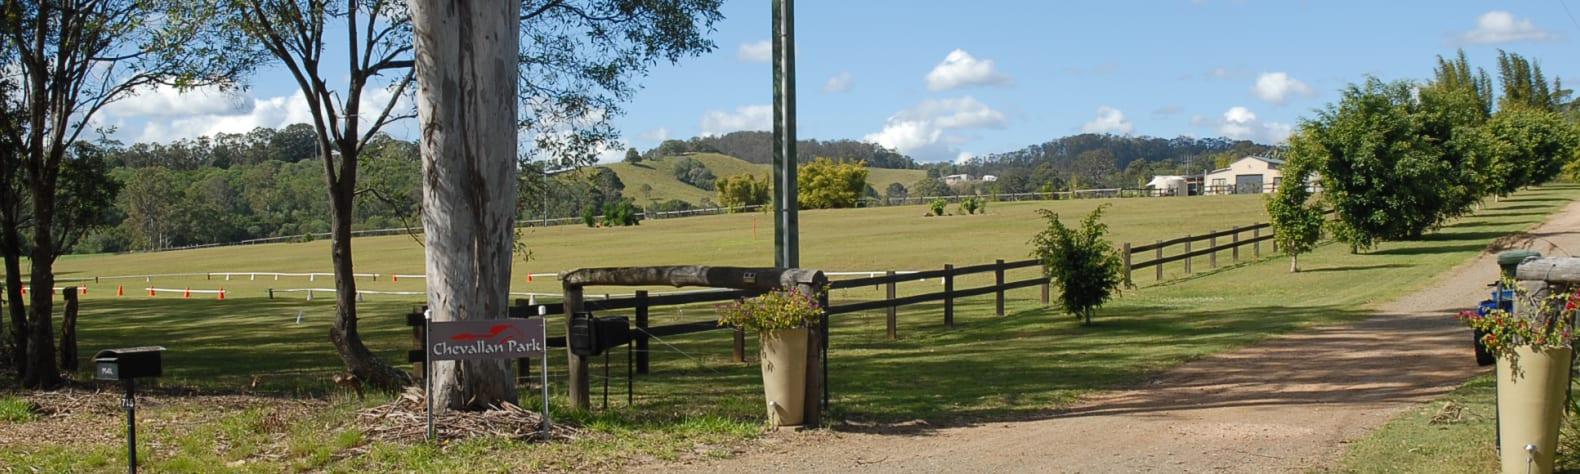 Chevallan Camp & Archery Park